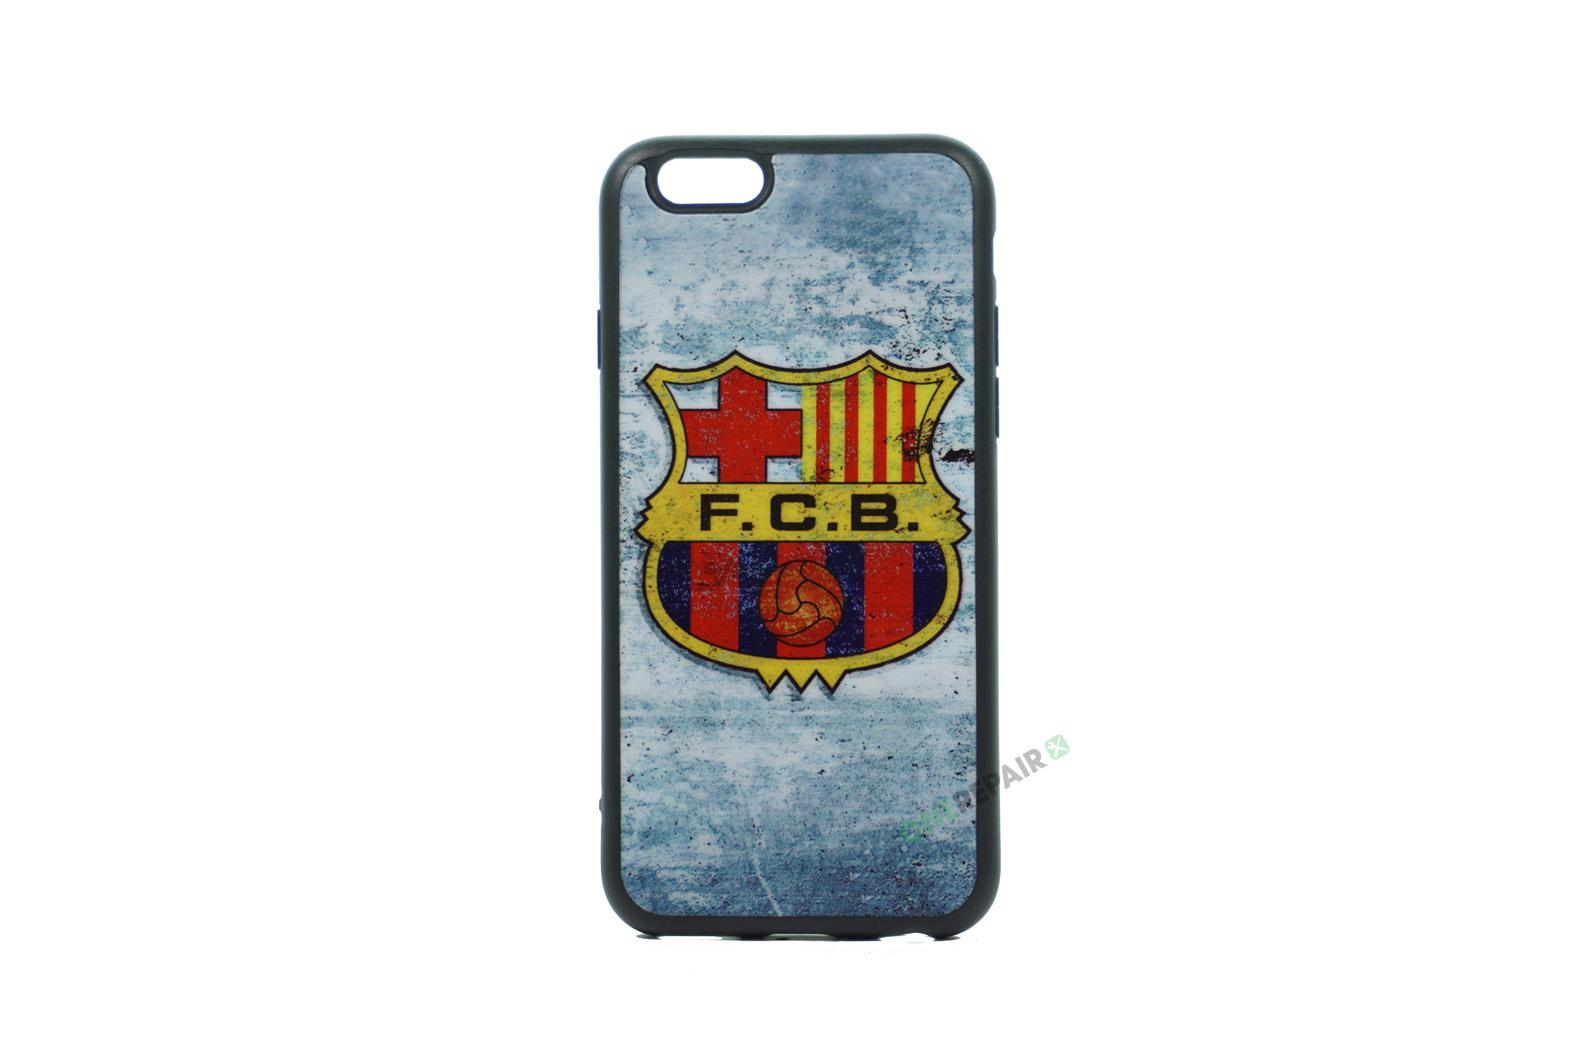 iPhone 6, 6S, A1549, A1586, A1589, A1633, A1688, A1700, A1691, Apple, Bagcover, Cover, Billig, Motiv, Fodbold, Klub, Barcelona, FC,